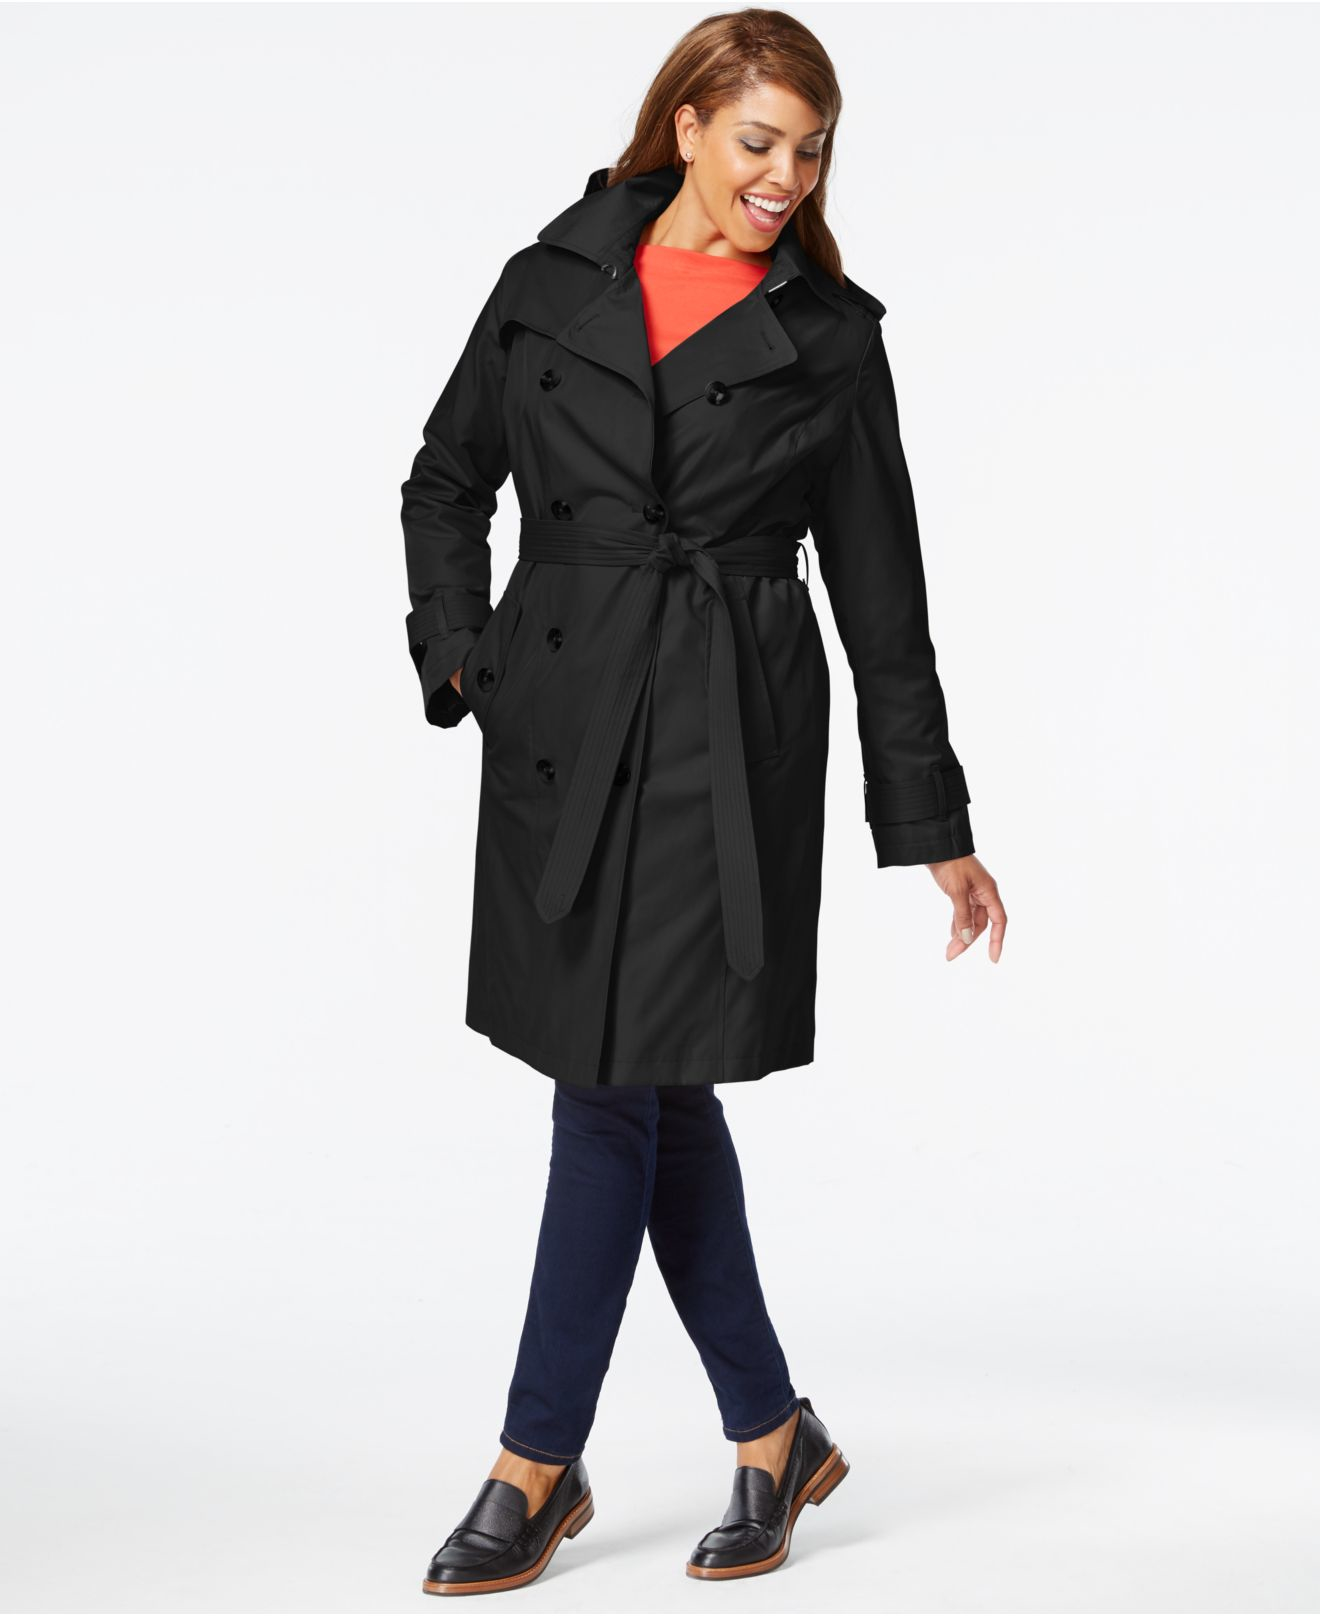 Plus Size Trench Coat - decorhstyle.com in 2020 | Plus